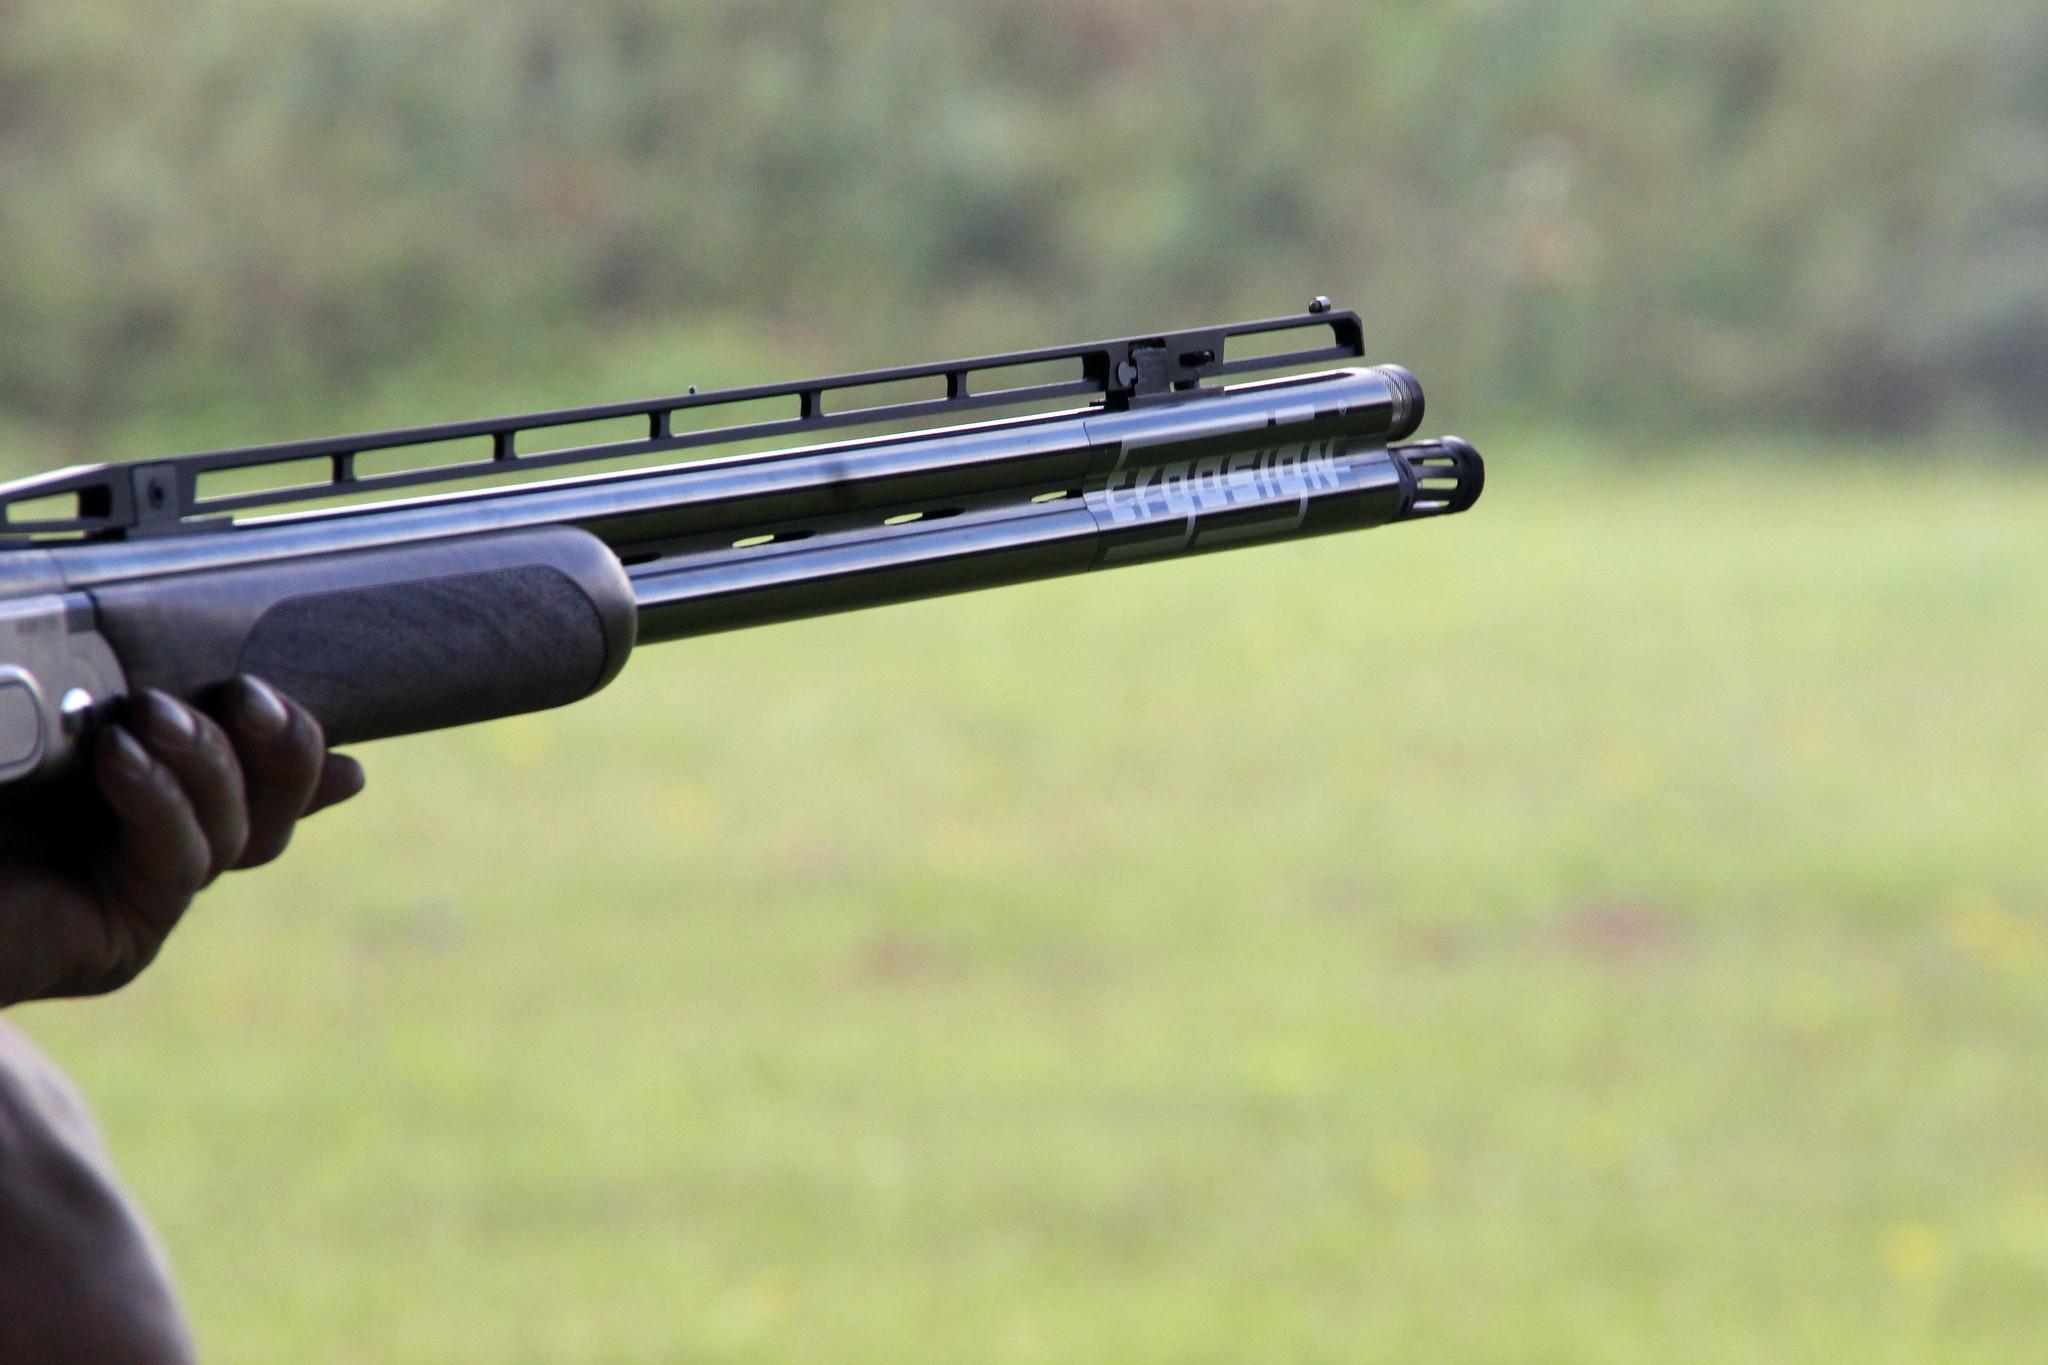 Shotgun Rifle Clay Pigeons Shoot 118164 Edited 2020